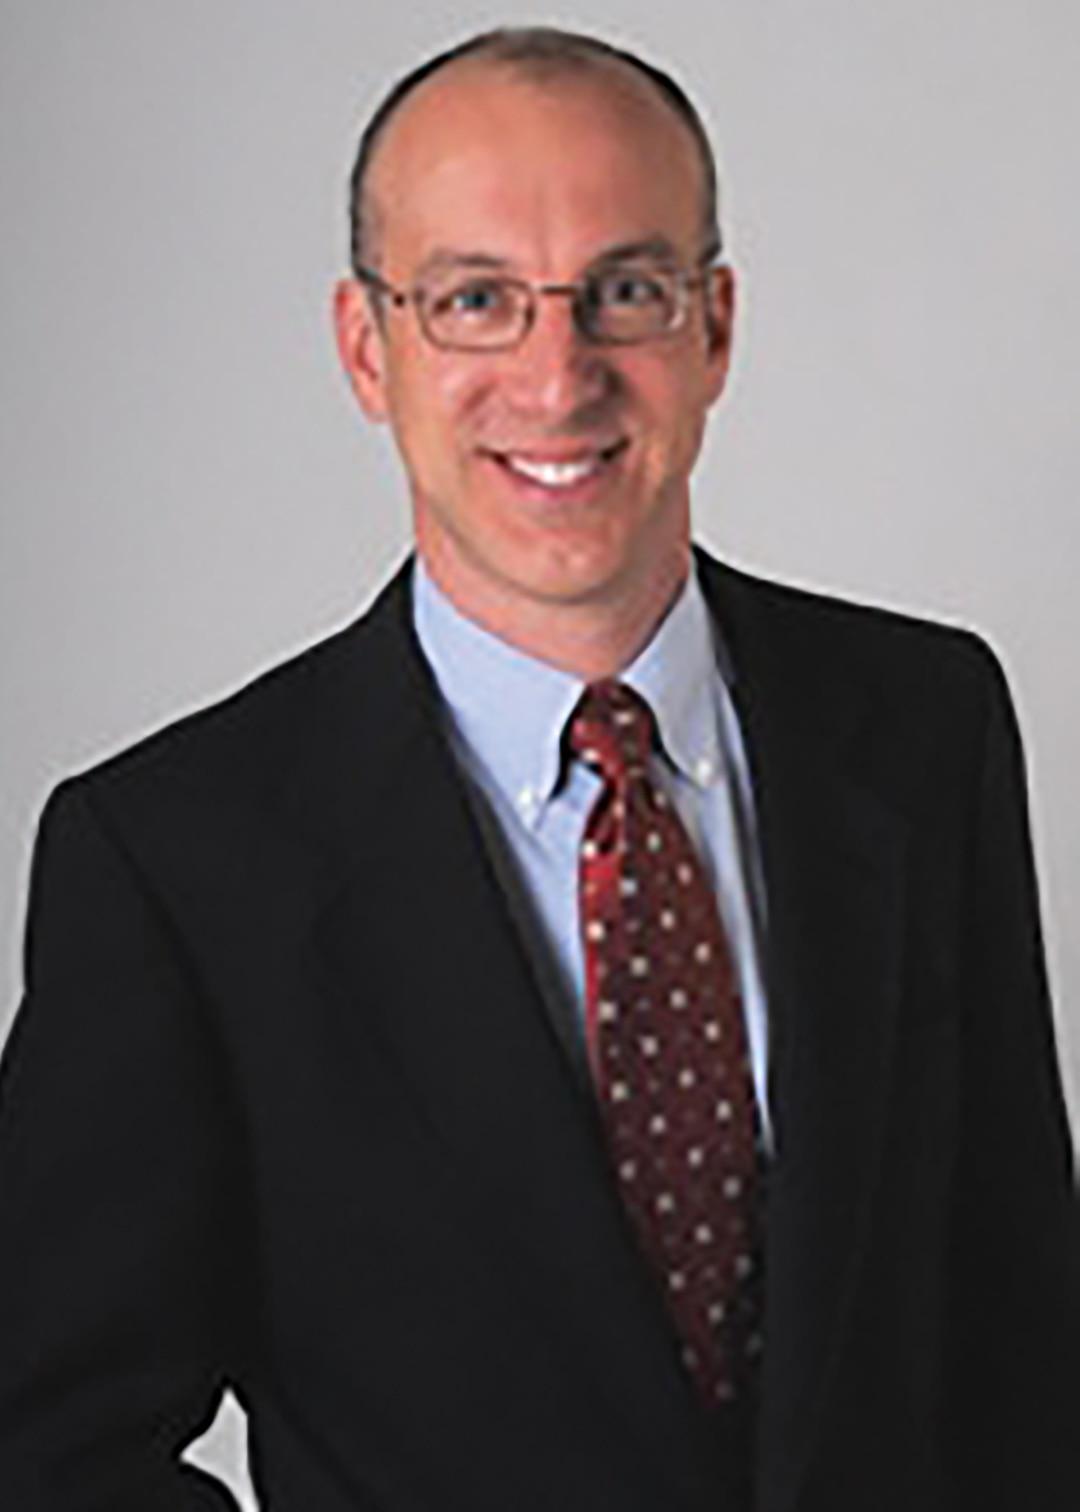 Dr. Rodney B. Ashworth, F.A.C.S